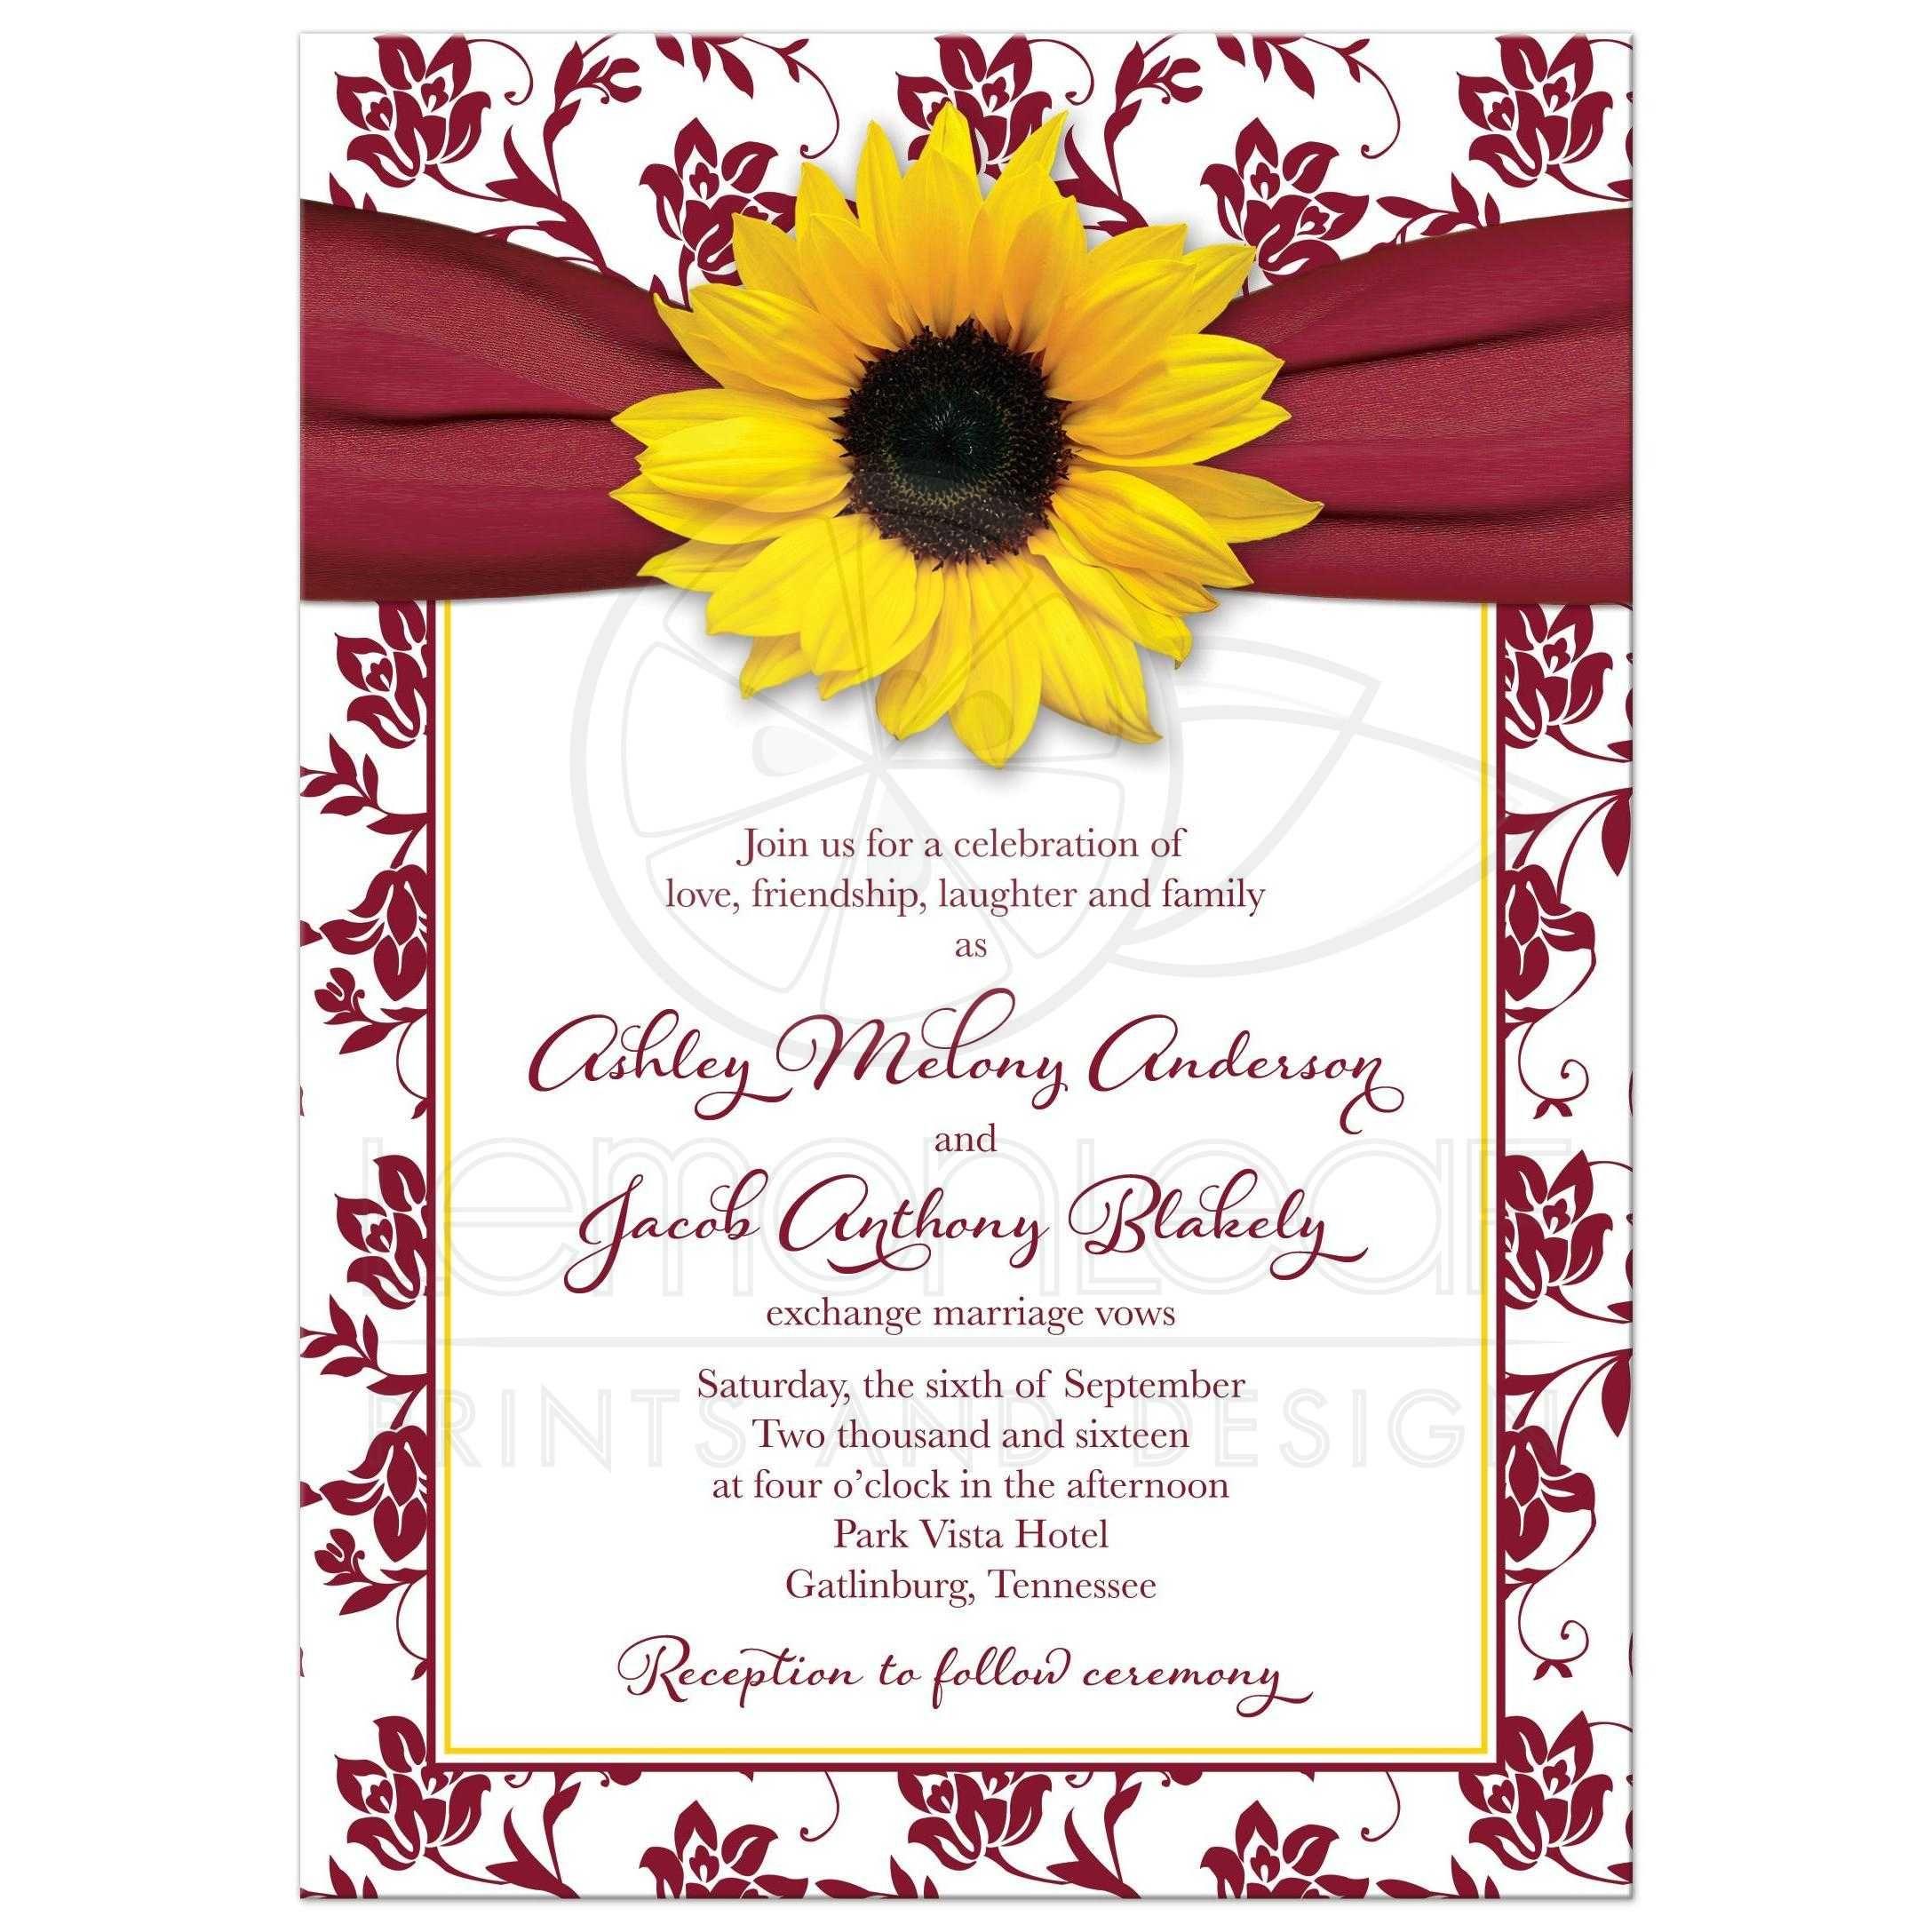 Fall Sunflower Wedding Invitation Burgundy Yellow